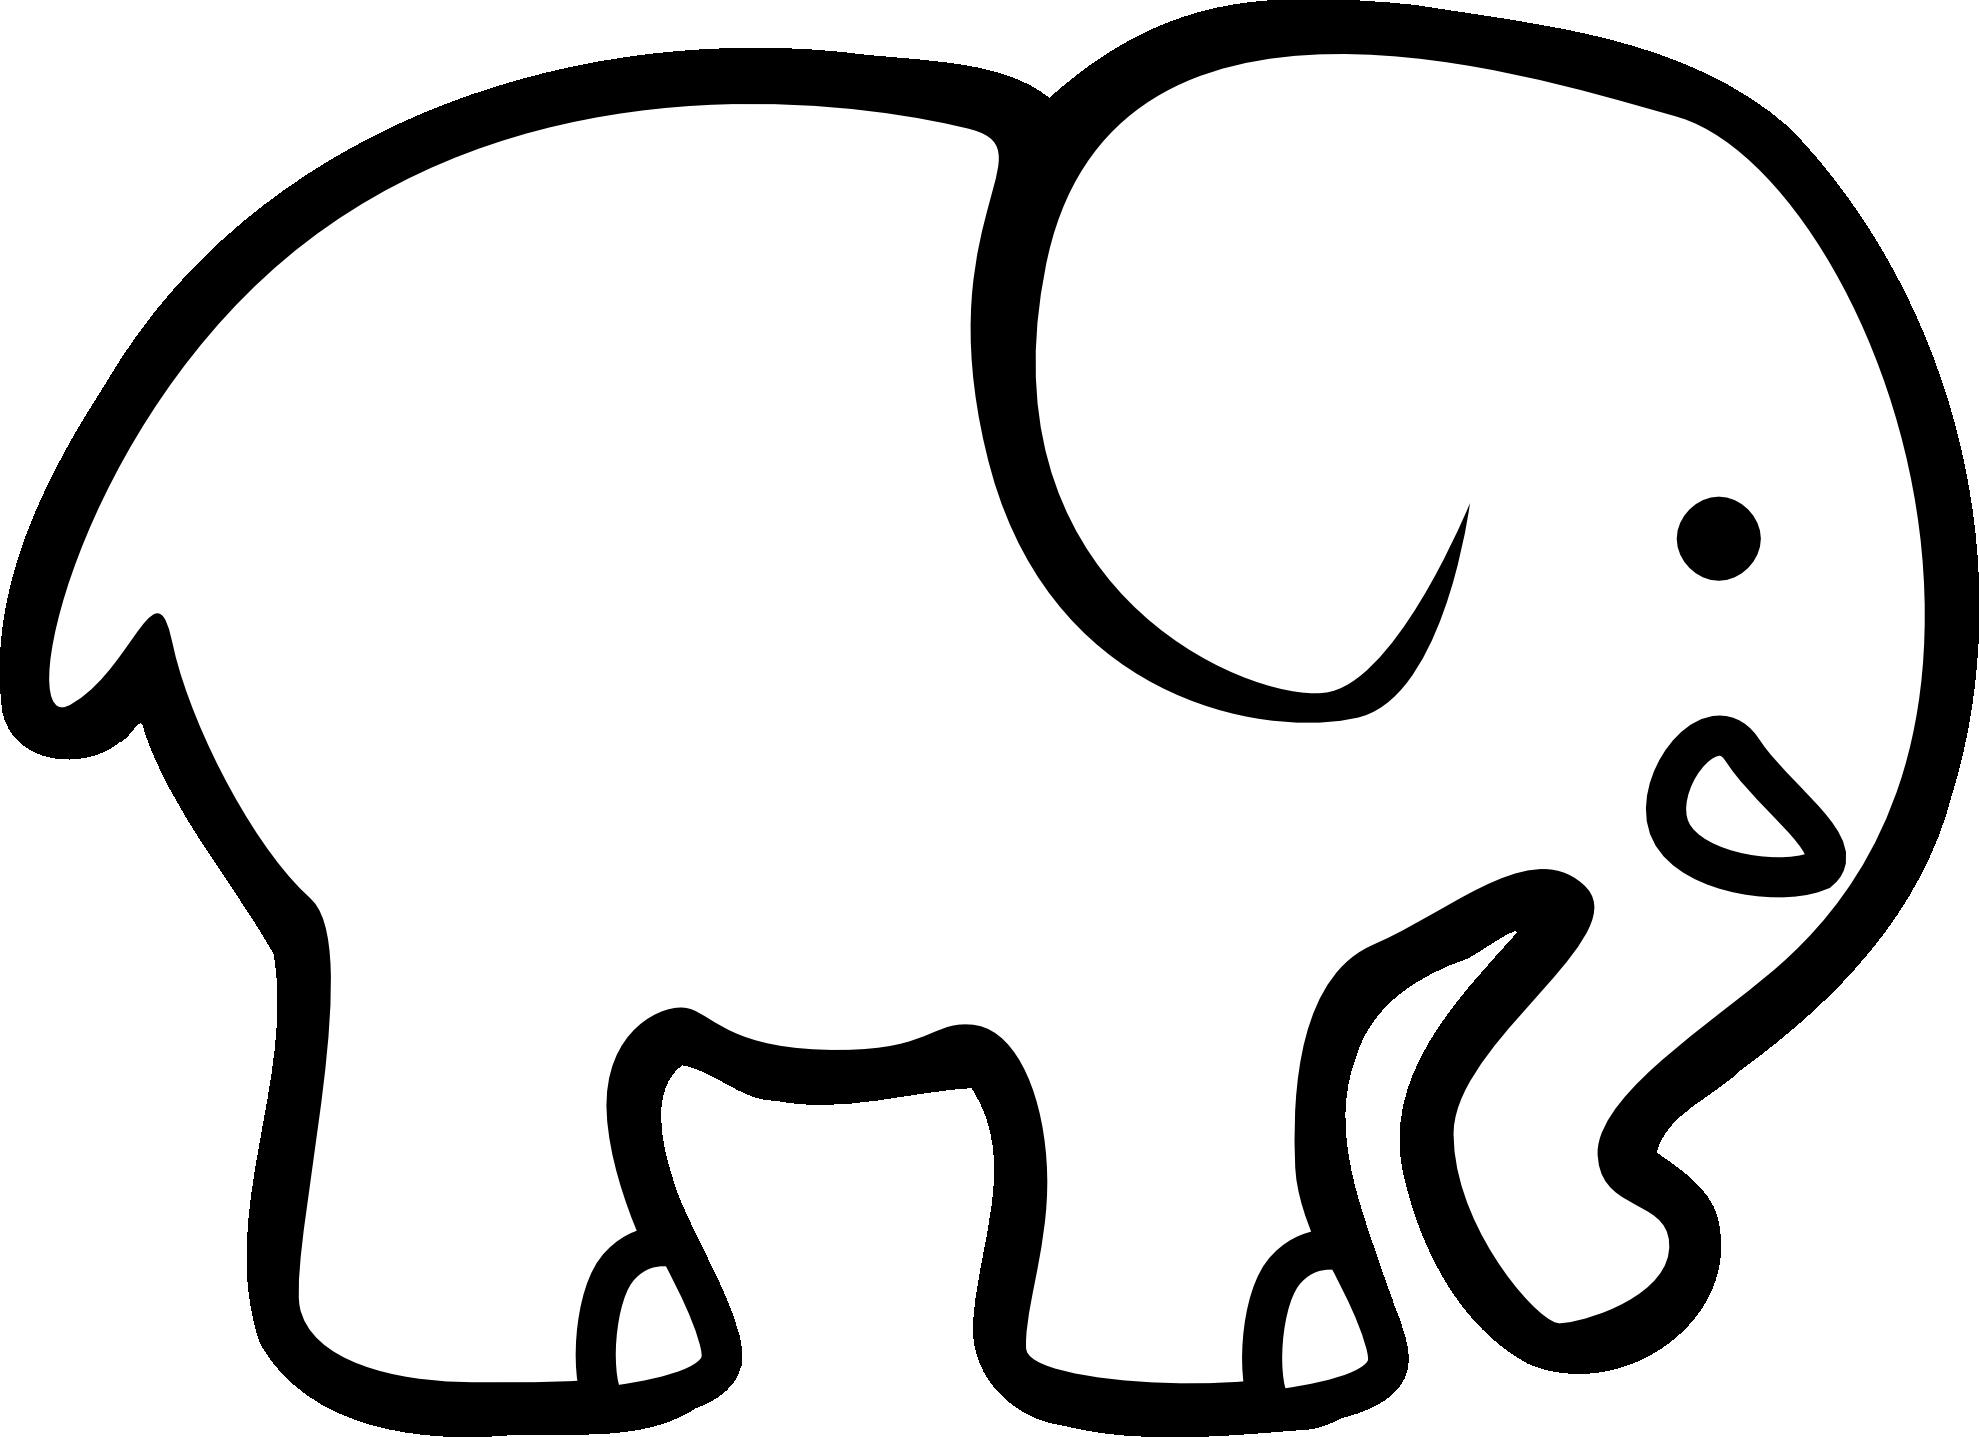 The Elephant List Open Communication Activity Elephant Clip Art Http Clipart Library Com Image Elephant Clip Art Elephant Pictures Elephant Coloring Page